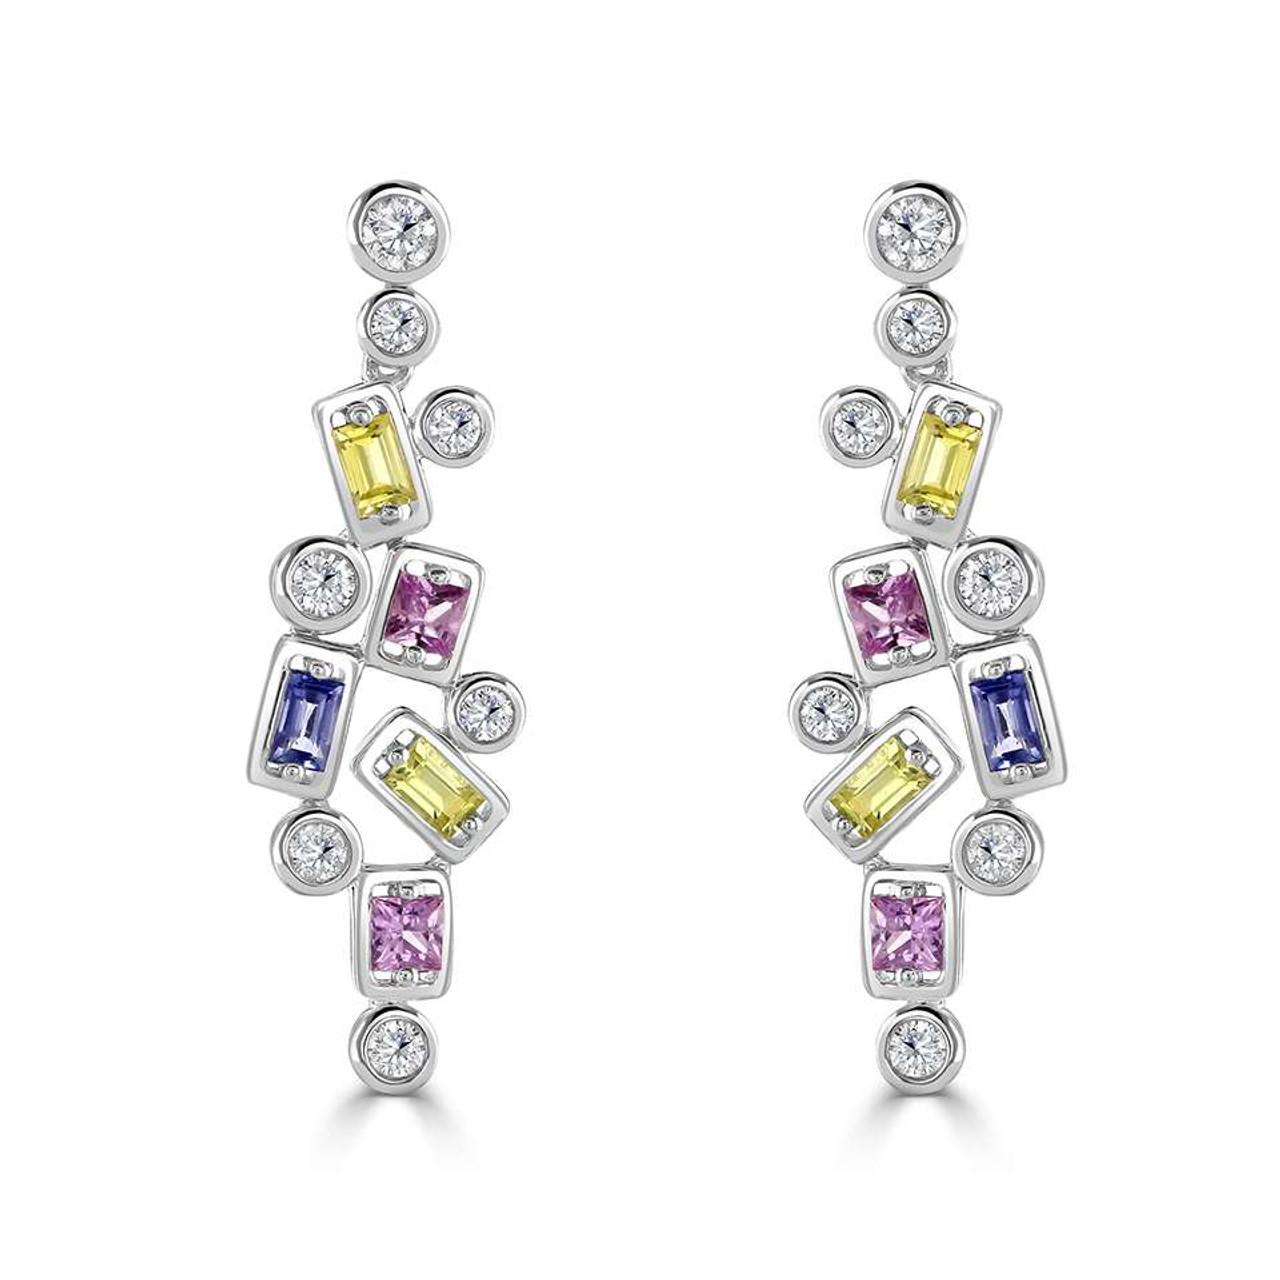 18ct White Gold Diamond & Sapphire Confetti Drop Earrings